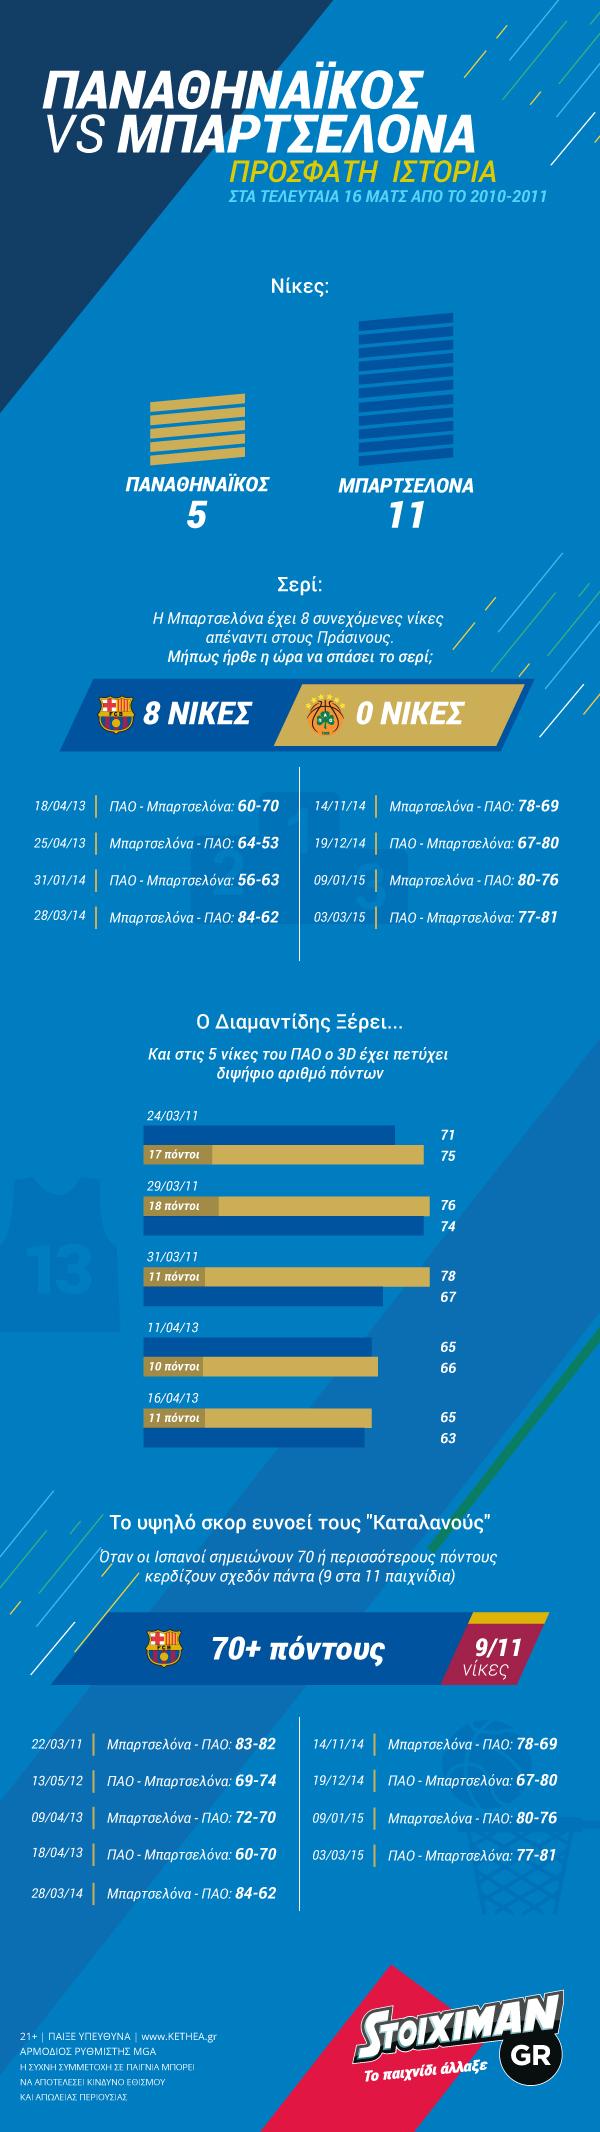 UPDstoiximan-pao barca-infographic v3